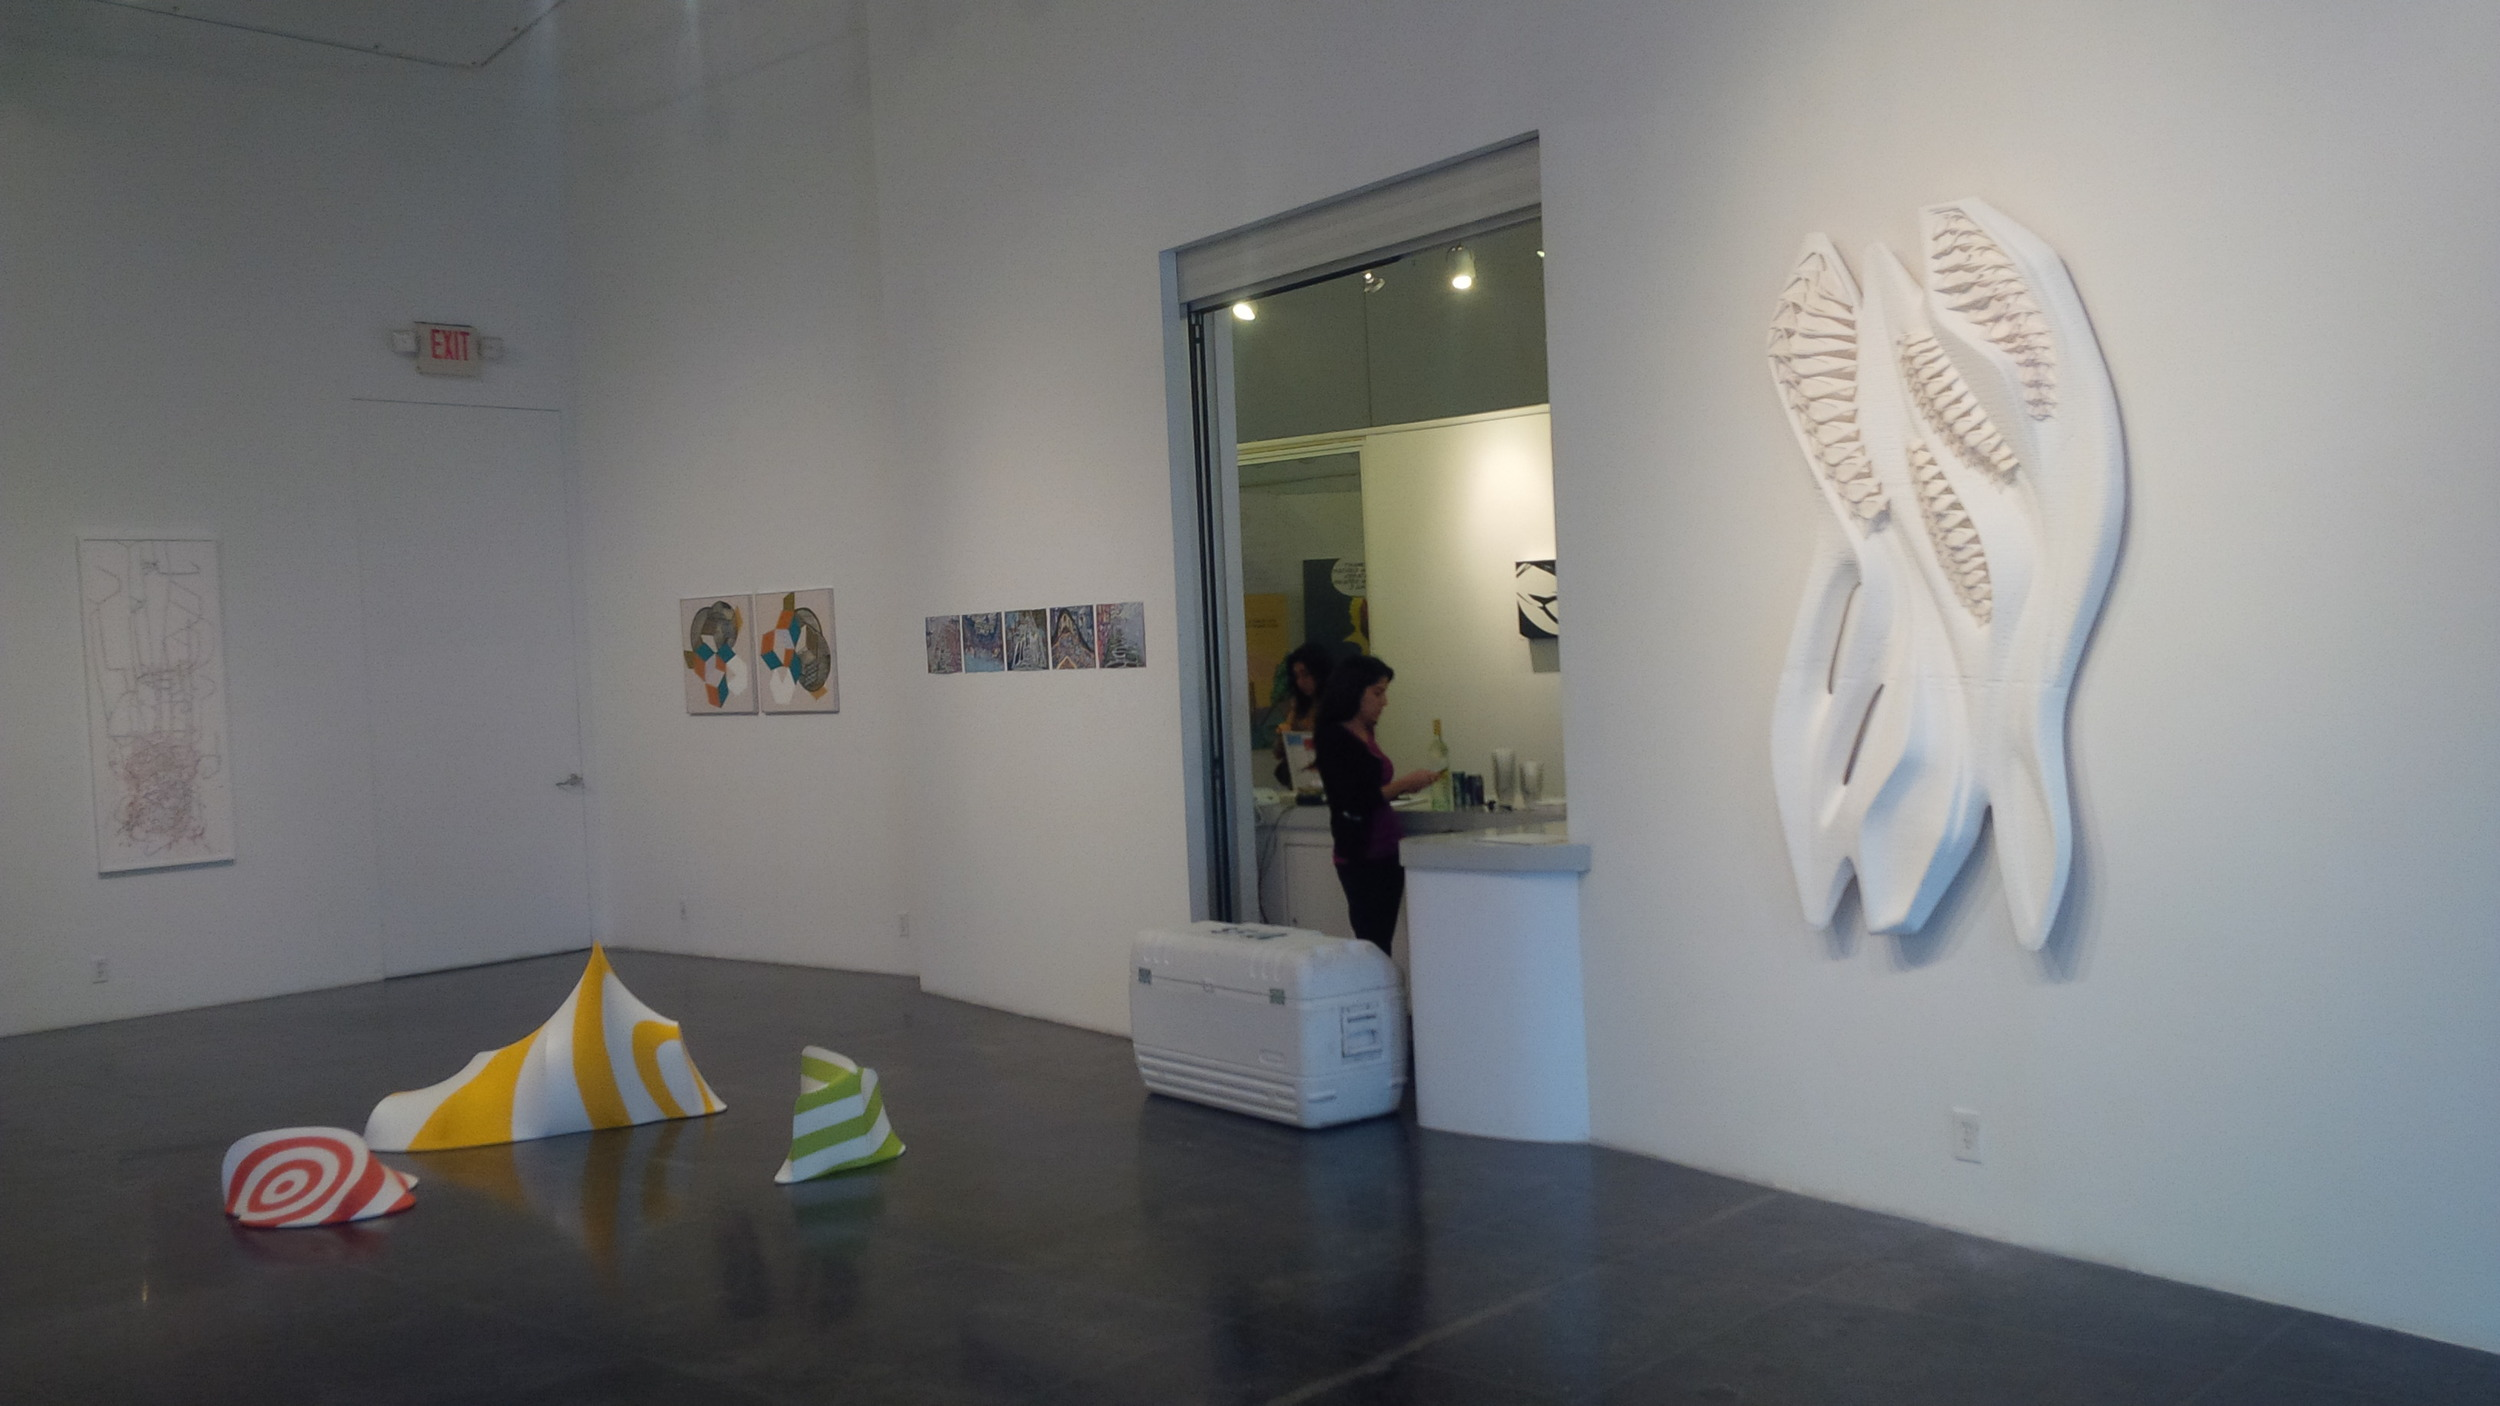 MONAD Studio, RHYTHMICITY, 2013 (right)